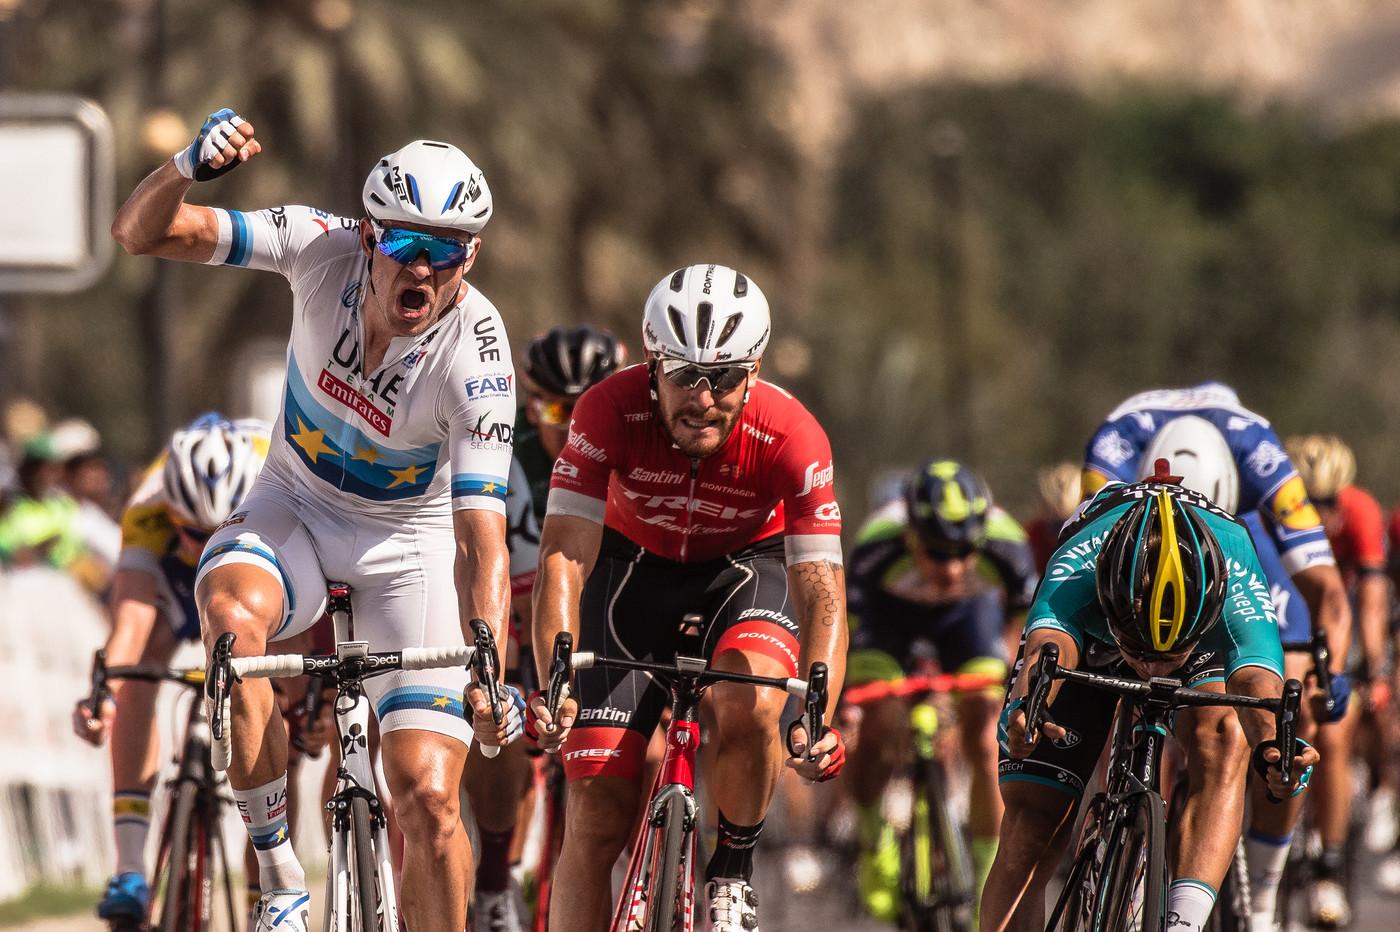 Kristoff wins Stage 6 Oman